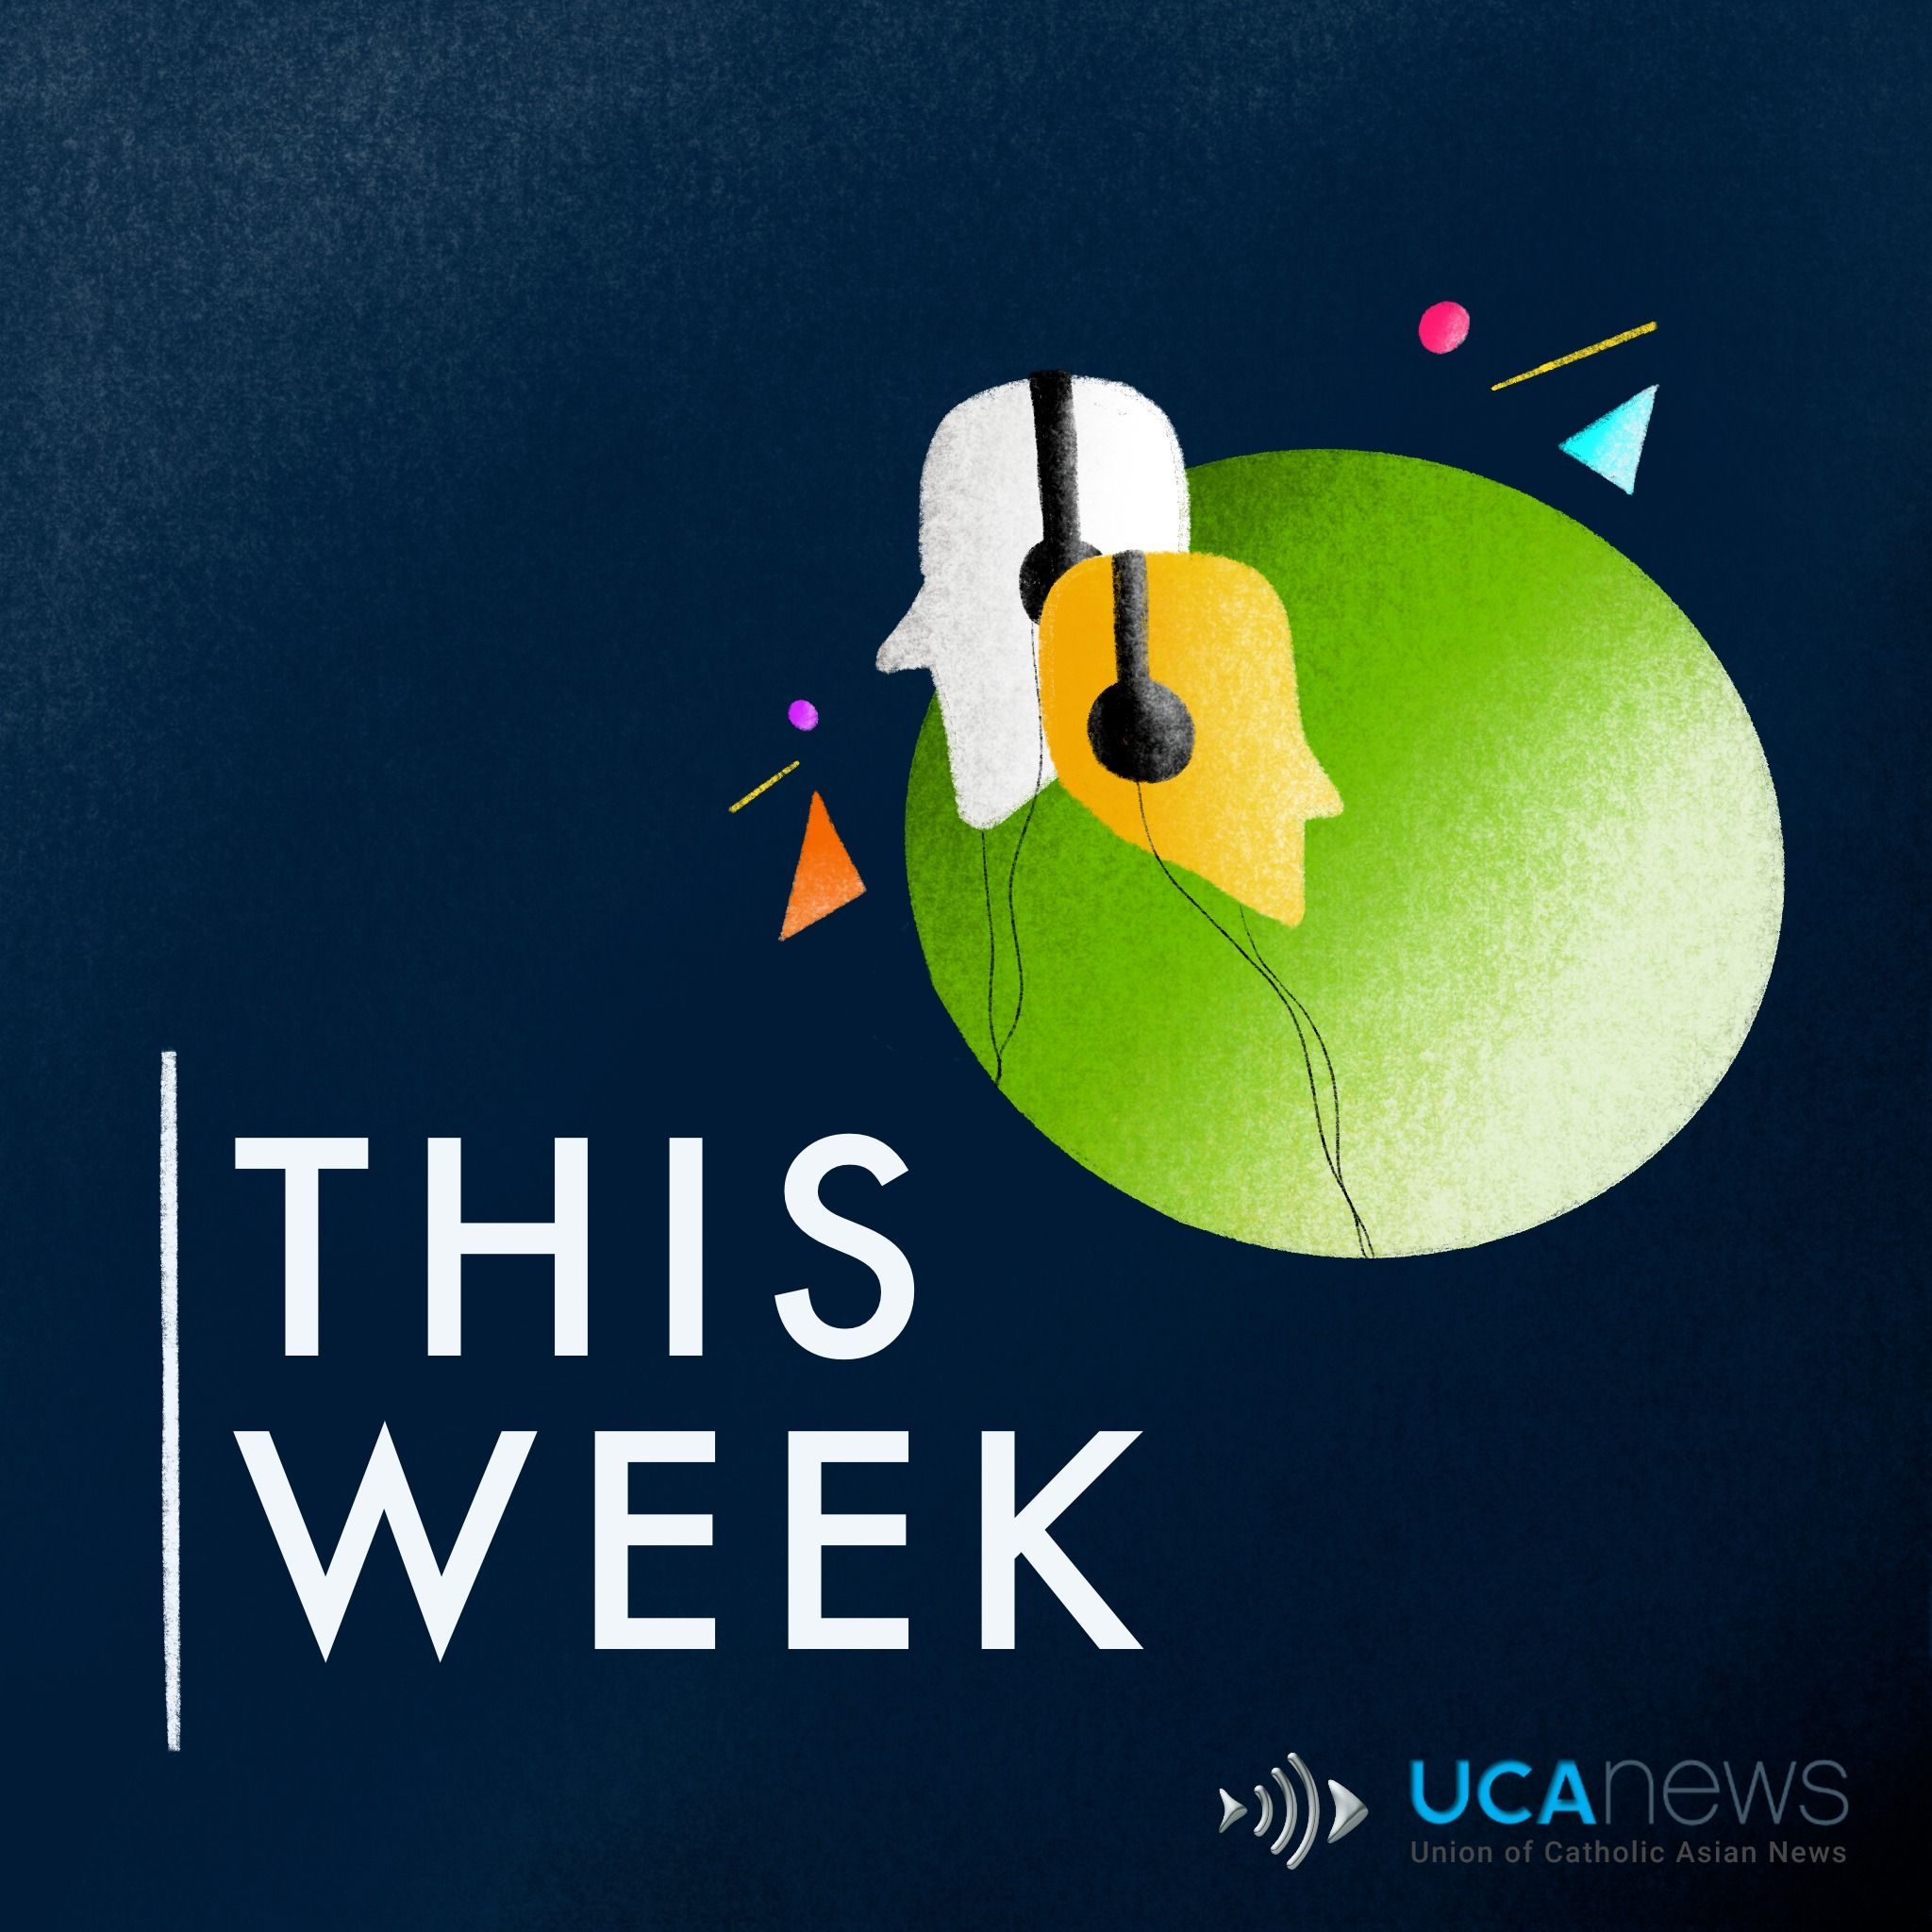 UCA News Weekly Summary, February 12, 2021